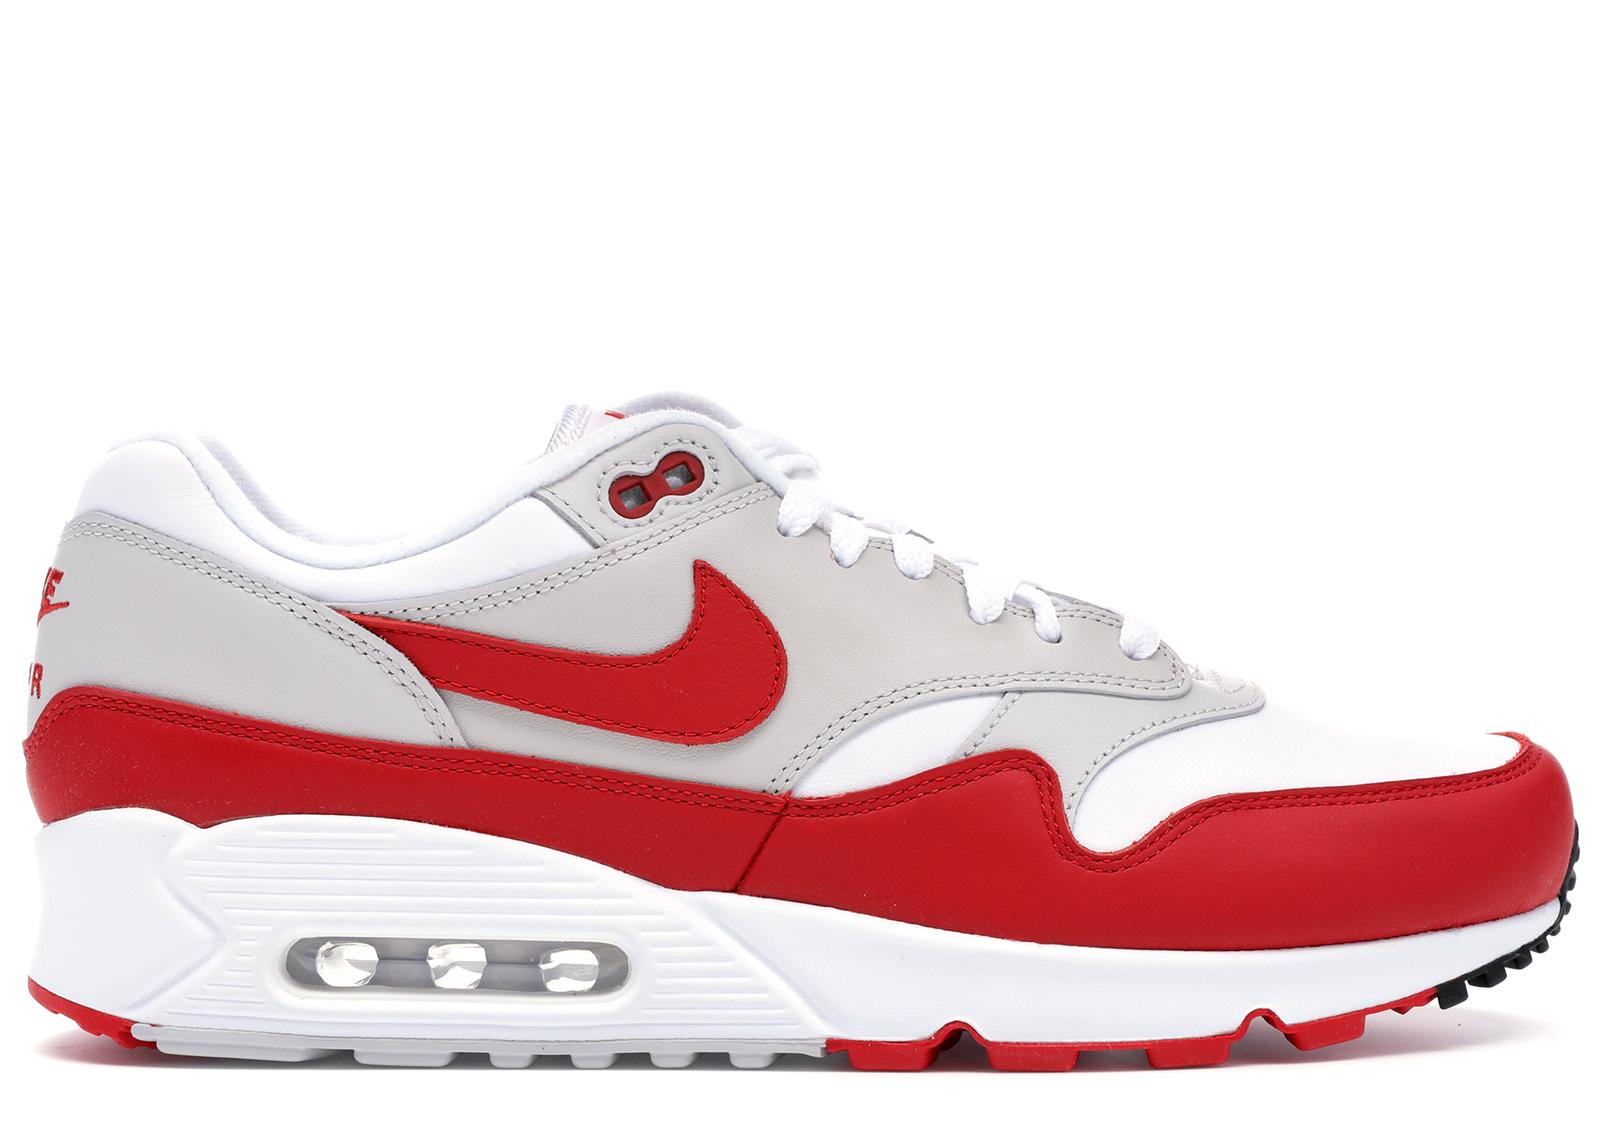 Nike Air Max 90/1 Sport Red - AJ7695-100